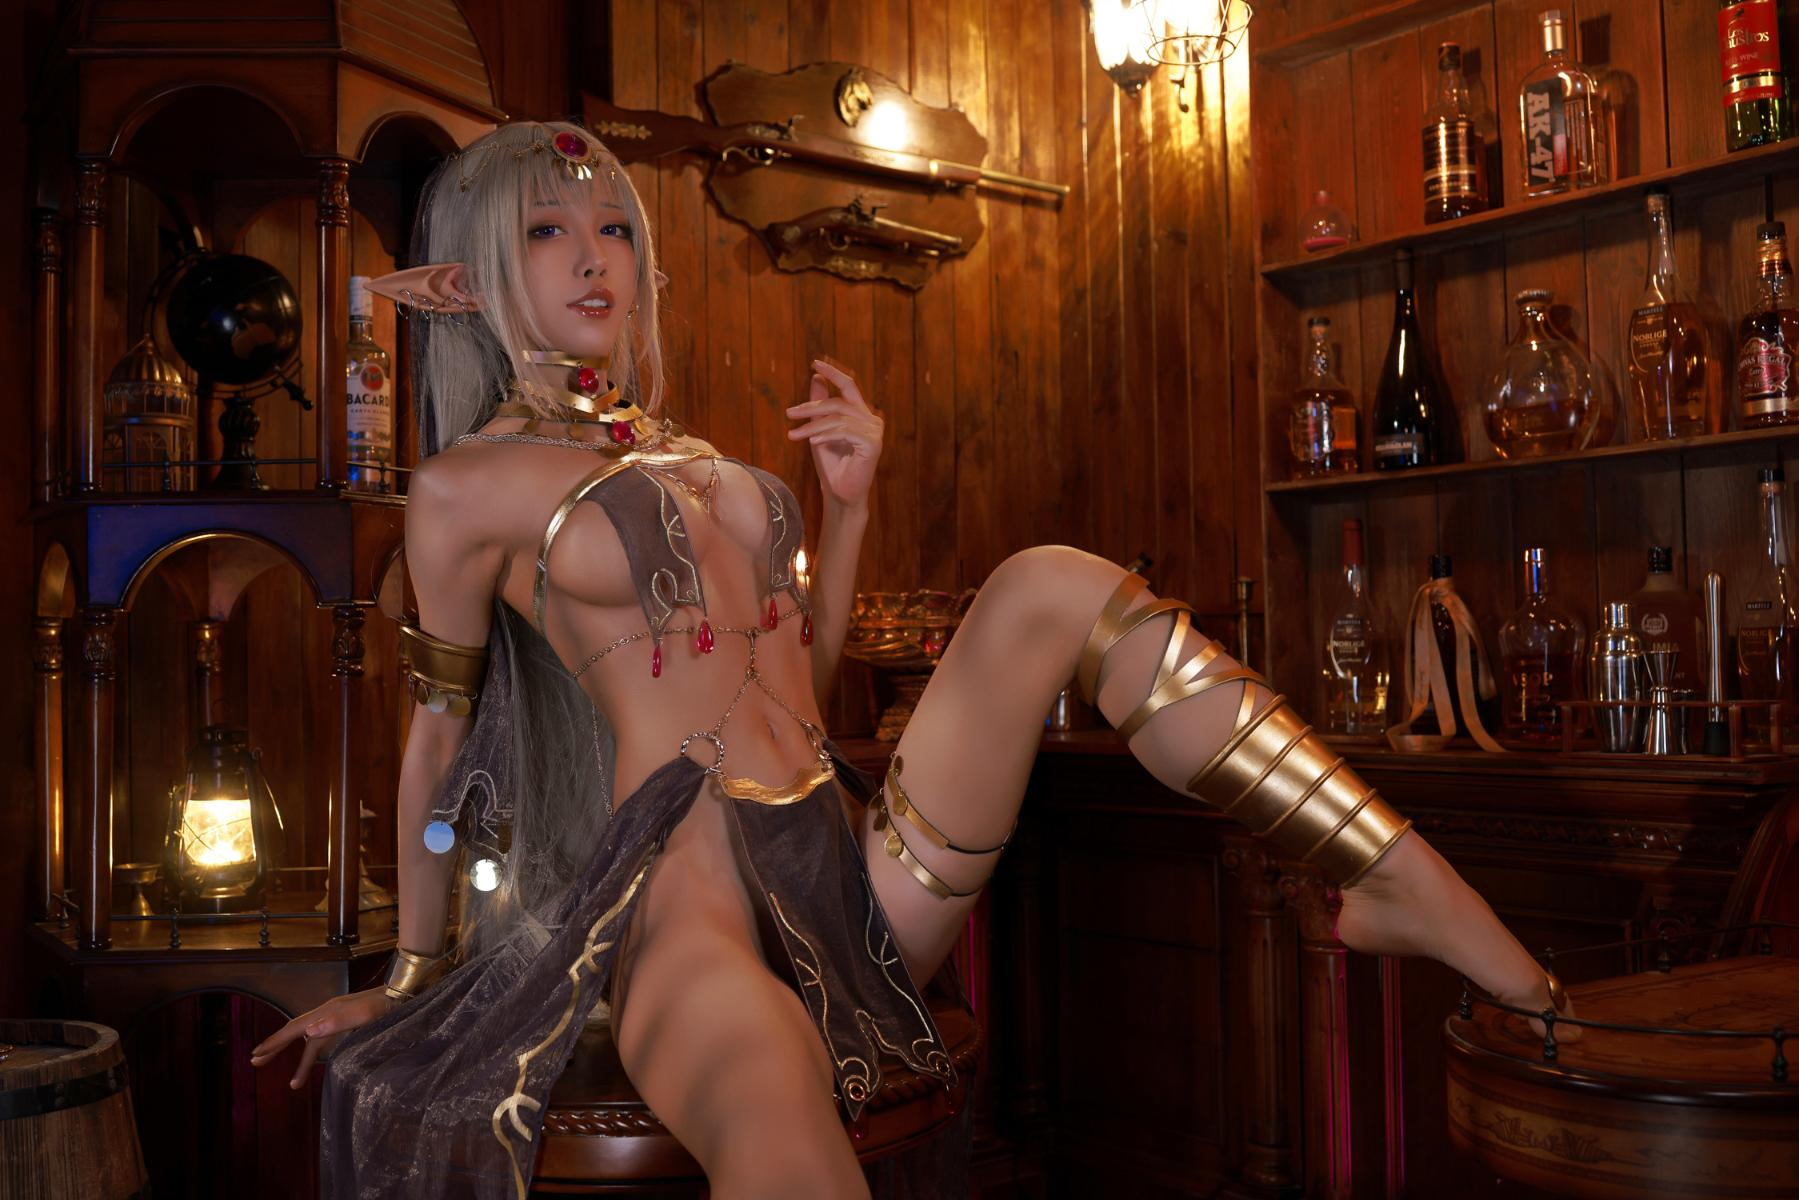 Tan Dancer Elf Succubus Cosplay by Aqua 13